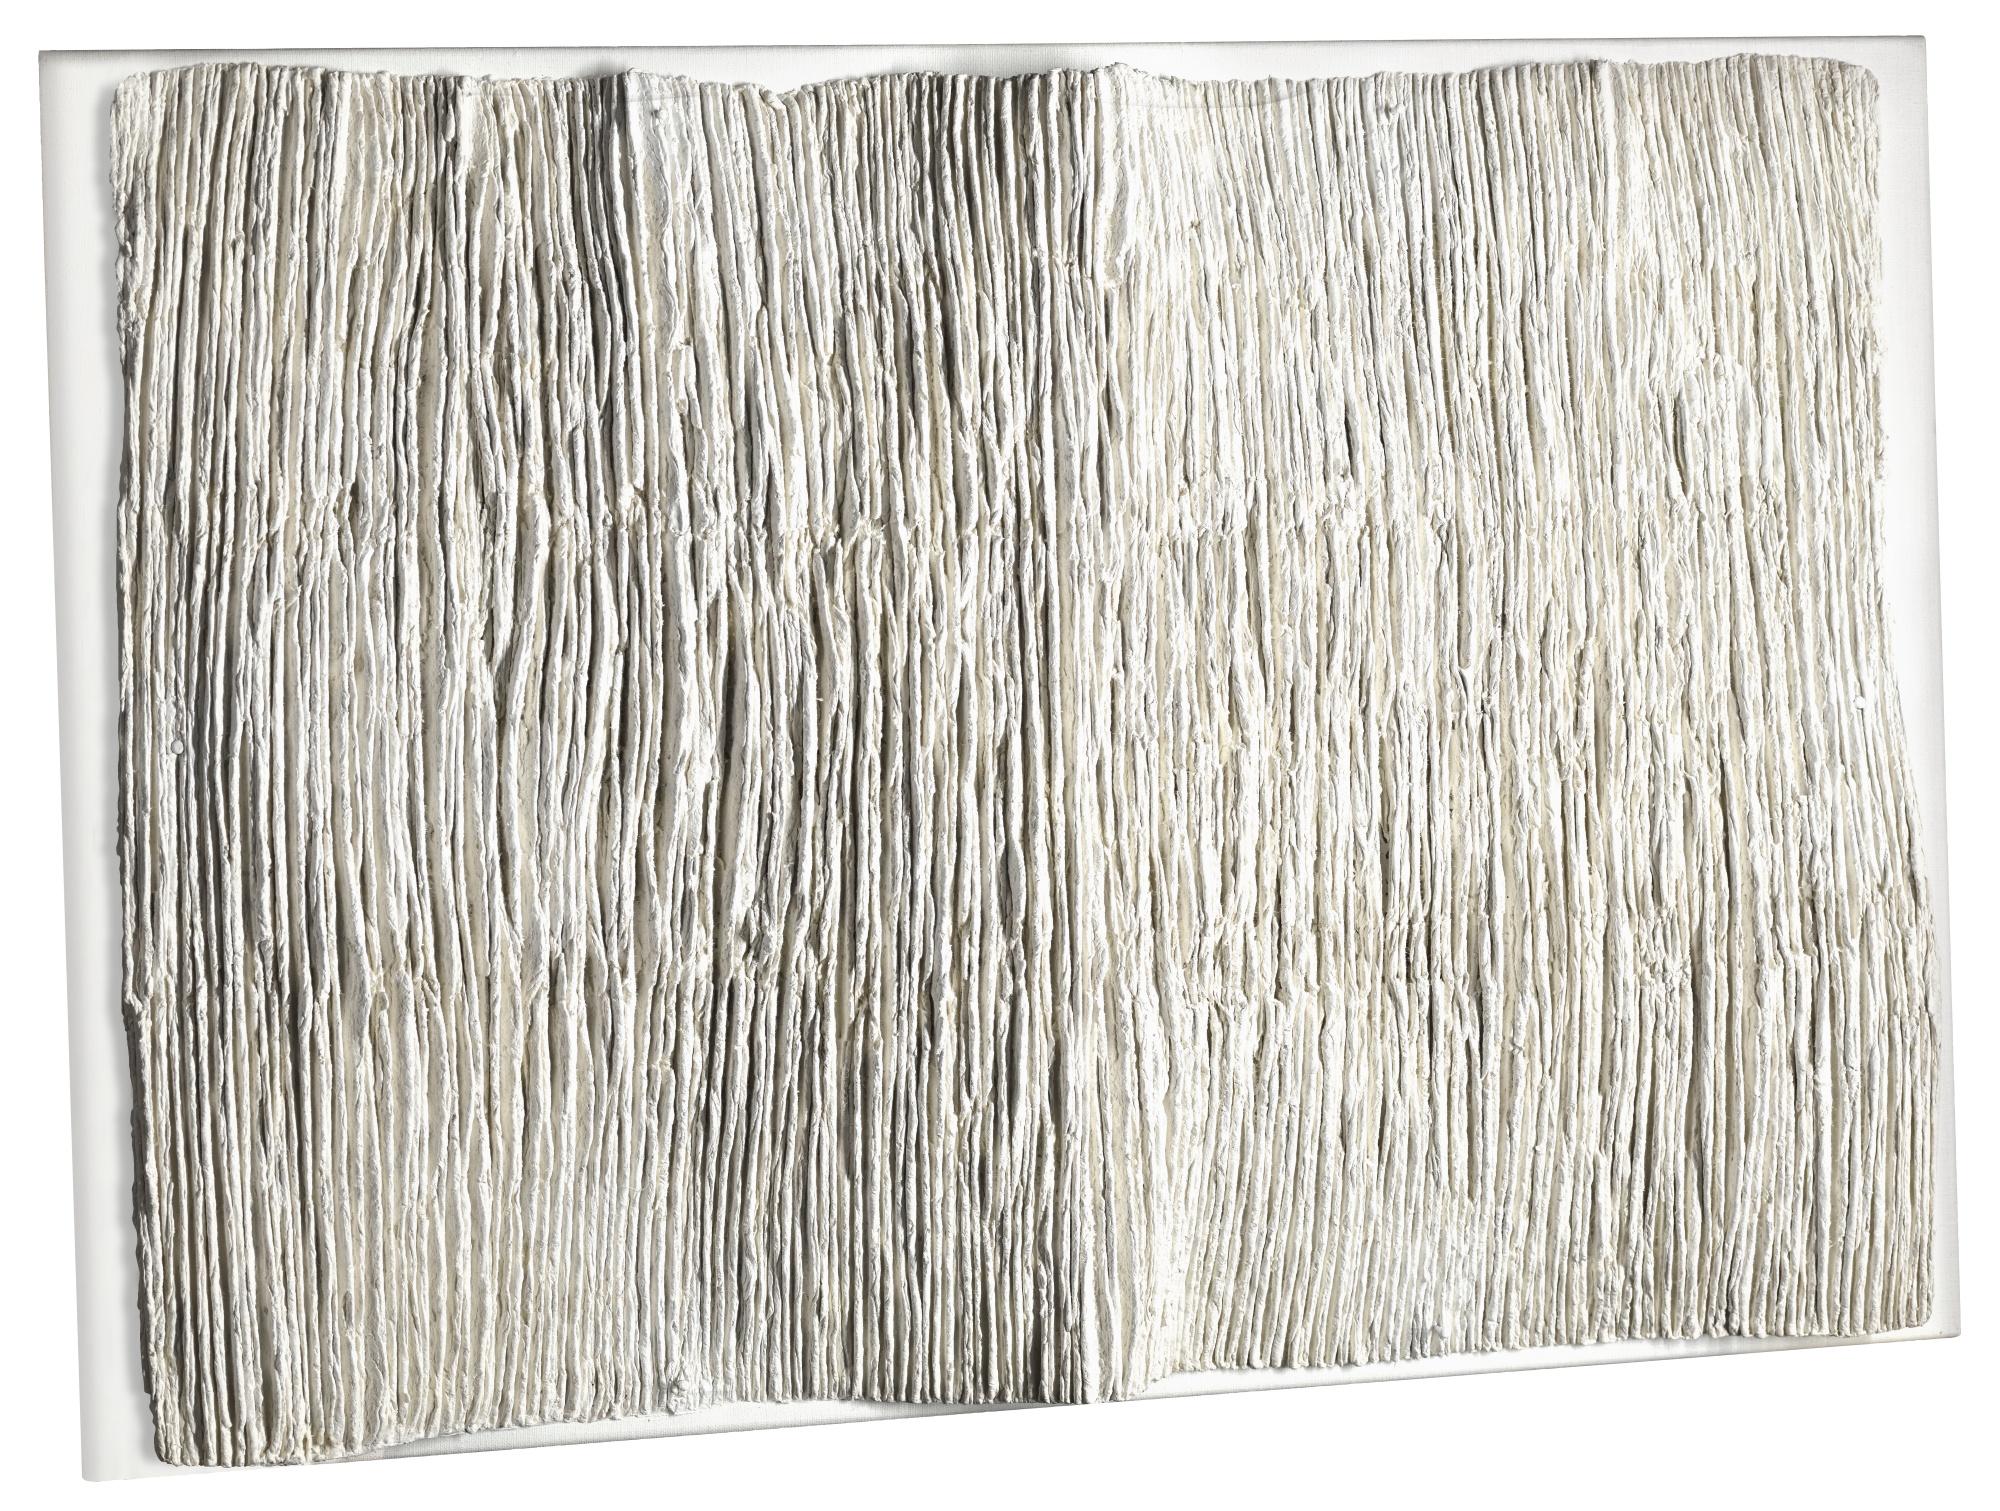 Jan Schoonhoven Jr-White Wave Jj.S13-14-2013